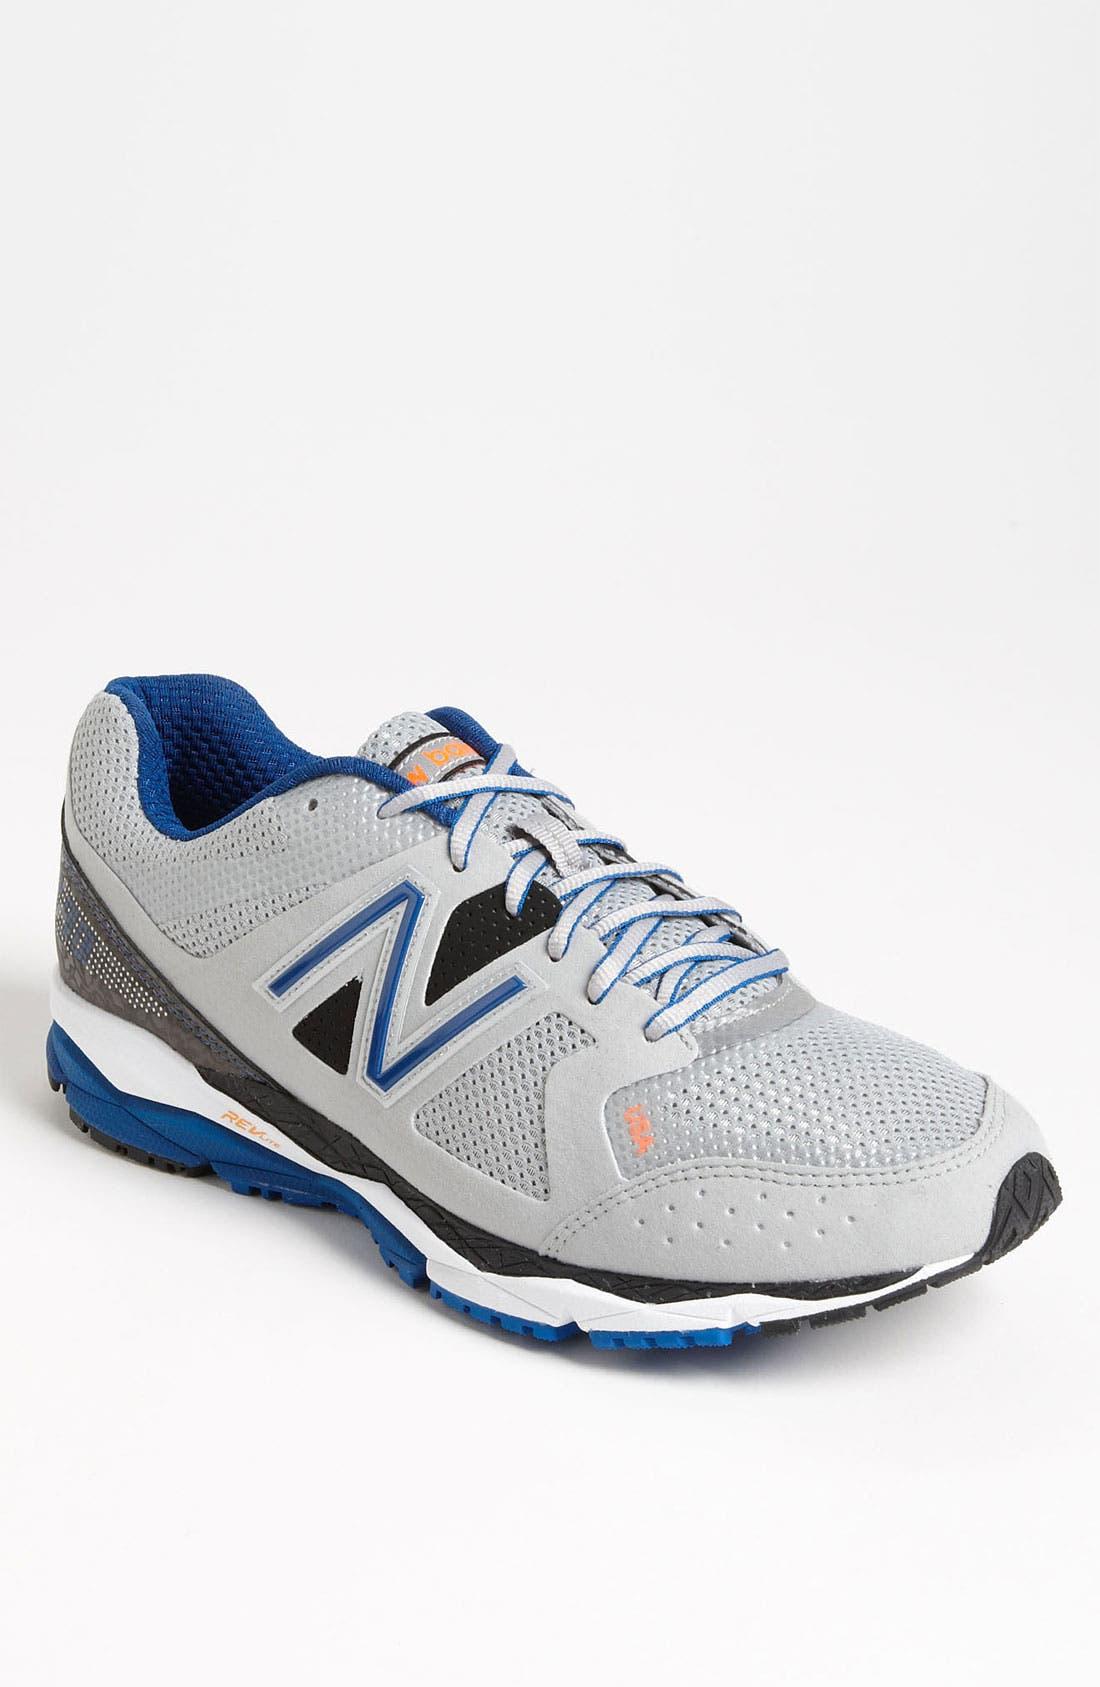 Alternate Image 1 Selected - New Balance '1290' Running Shoe (Men)